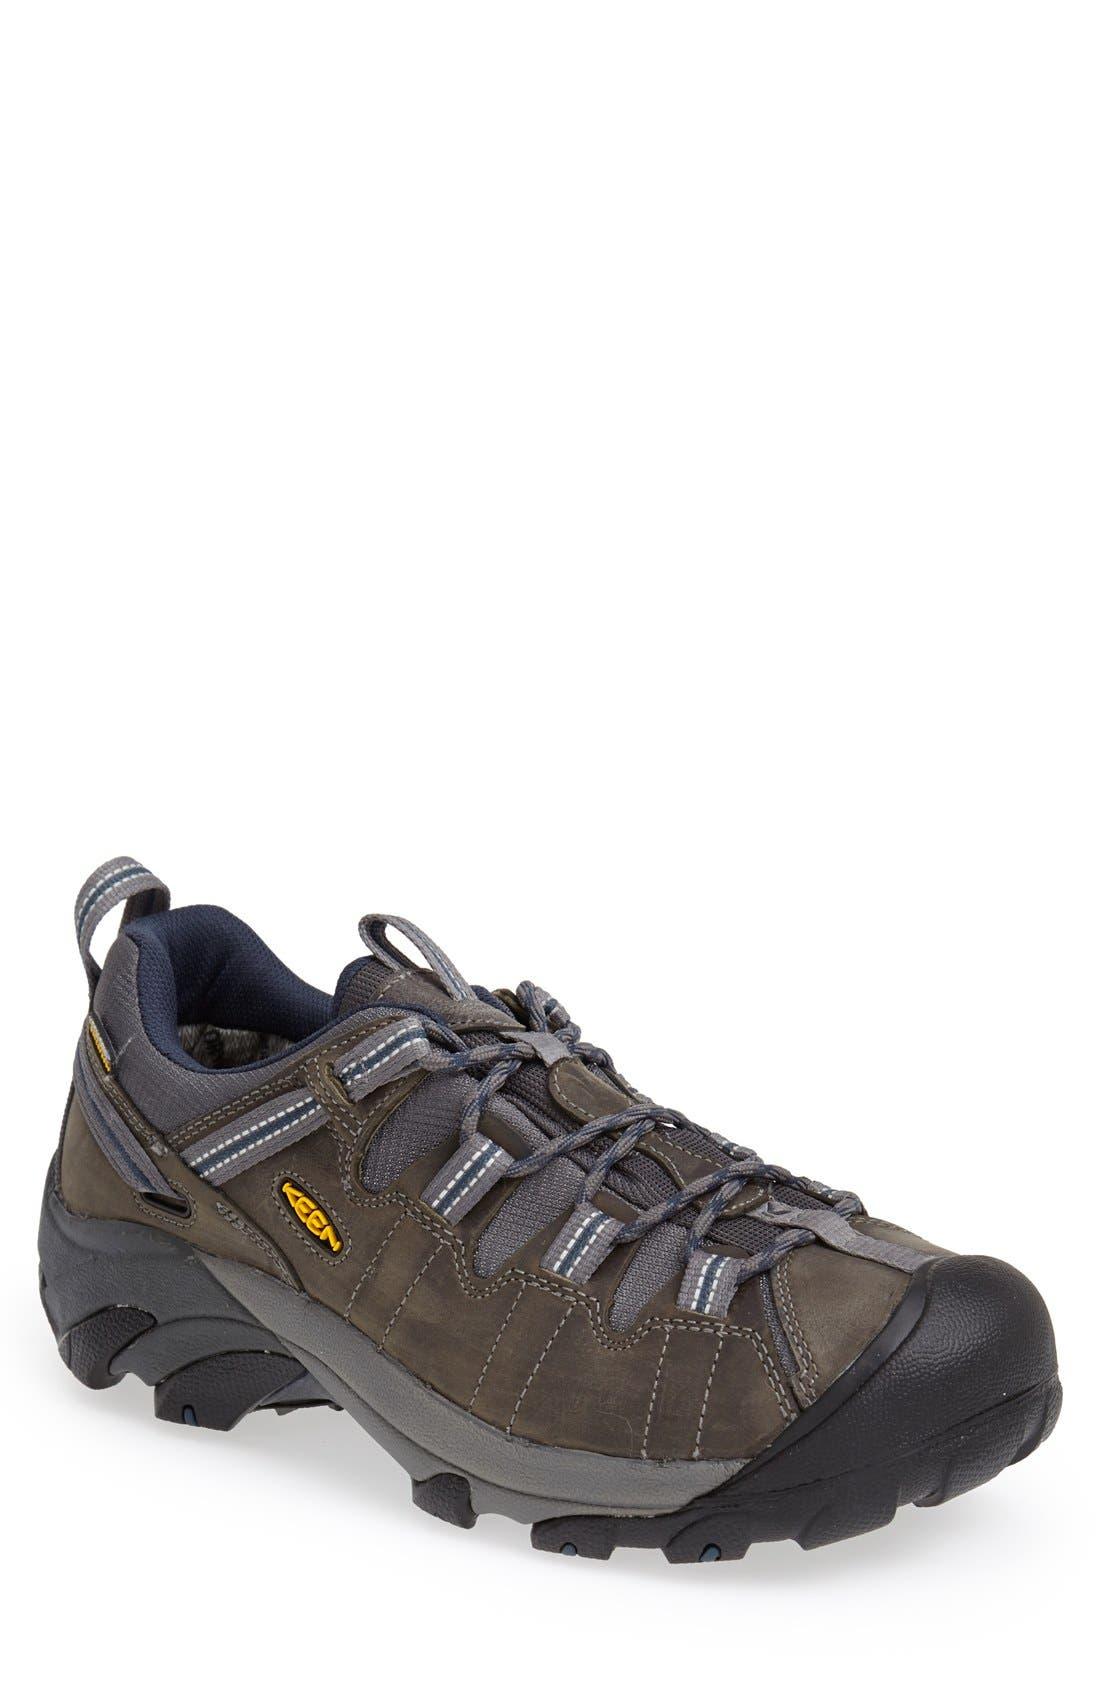 KEEN, 'Targhee II' Waterproof Hiking Shoe, Main thumbnail 1, color, GARGOLYE/ MIDNGHT NAVY